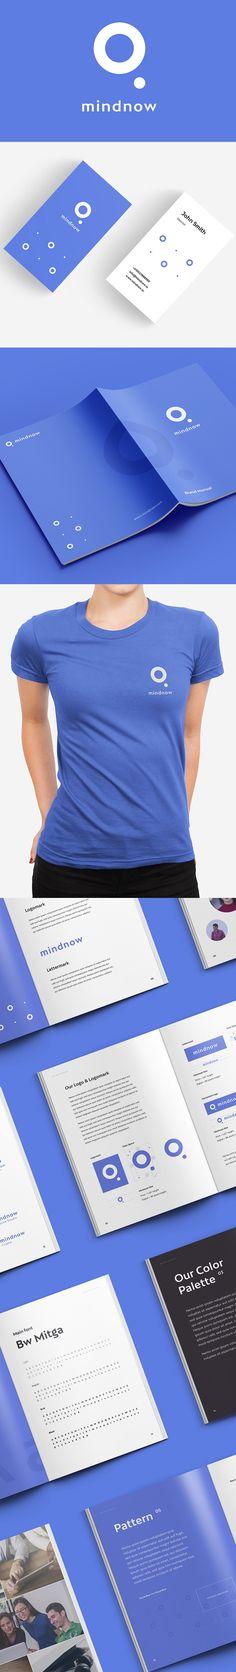 Branding: mindnow - Branding & Landing Page by Max Kardasevych - Free Corporate Identity Design, Brand Identity Design, Visual Identity, Branding Design, Logos, Logo Branding, Logo Design Examples, Graphic Design, Presentation Layout